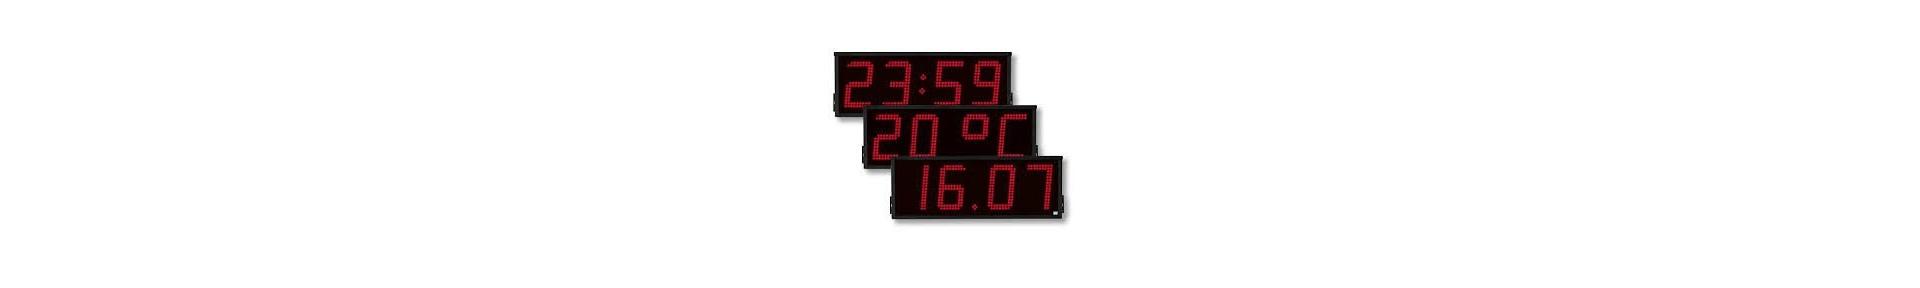 Time Temp